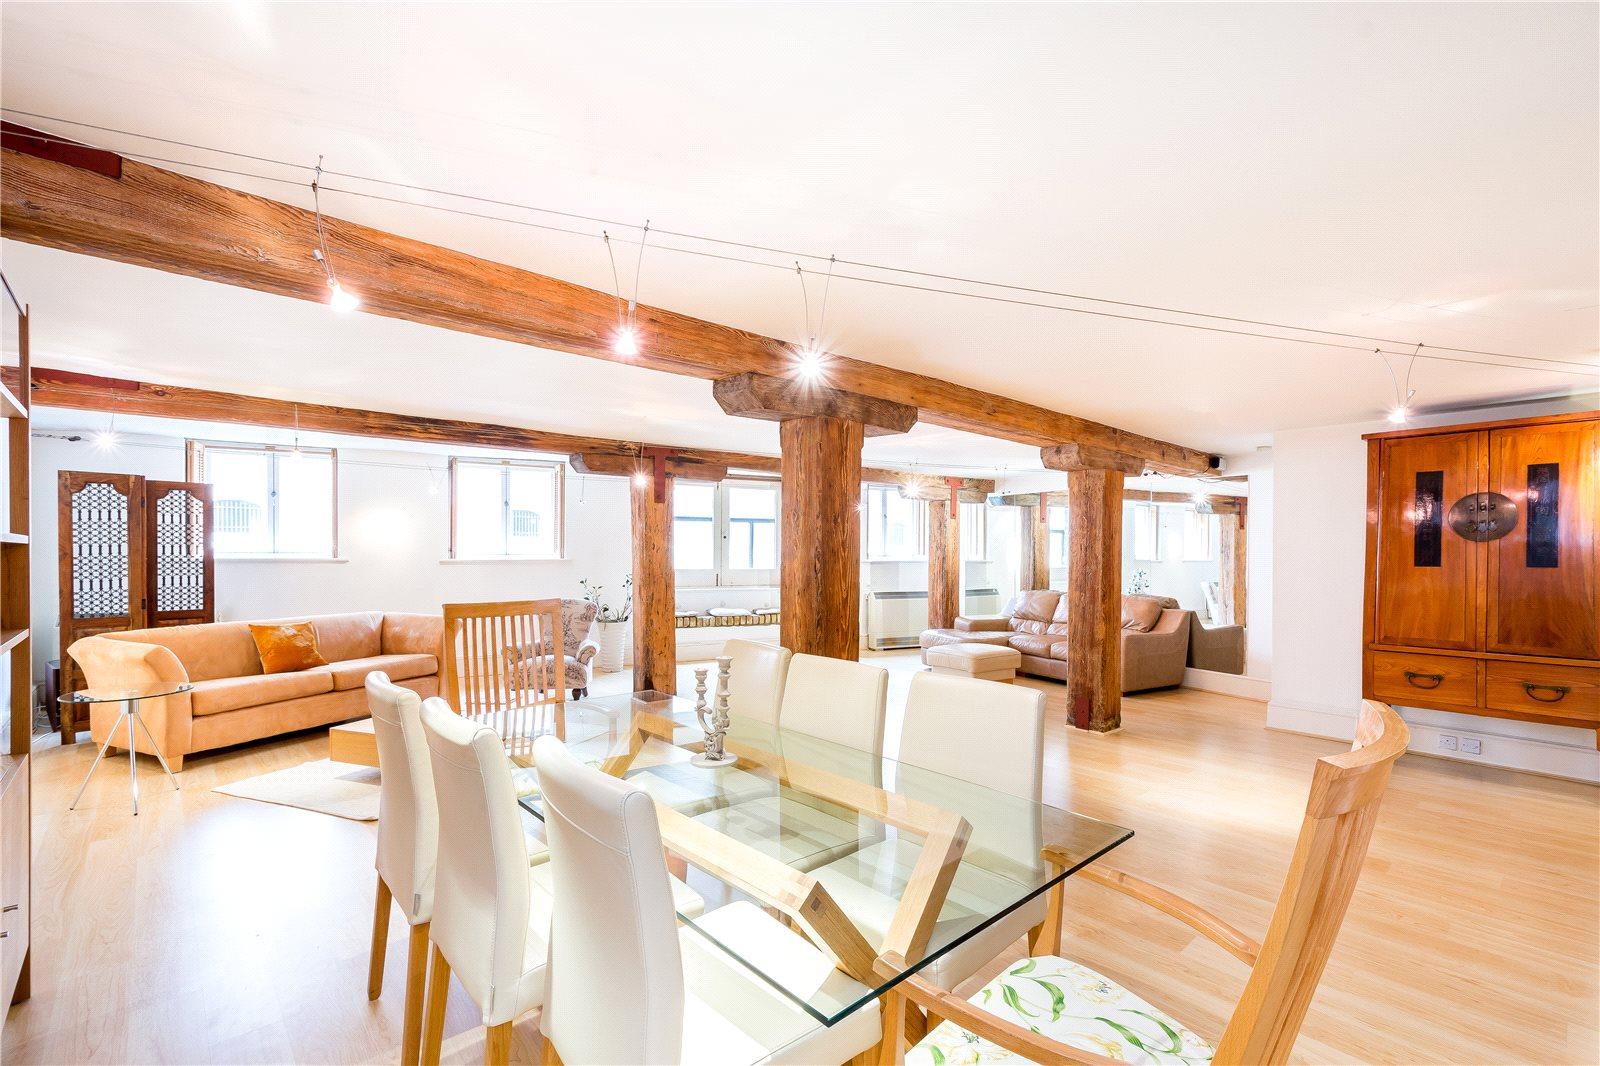 warehouse conversion,Shad Thames,Dining room